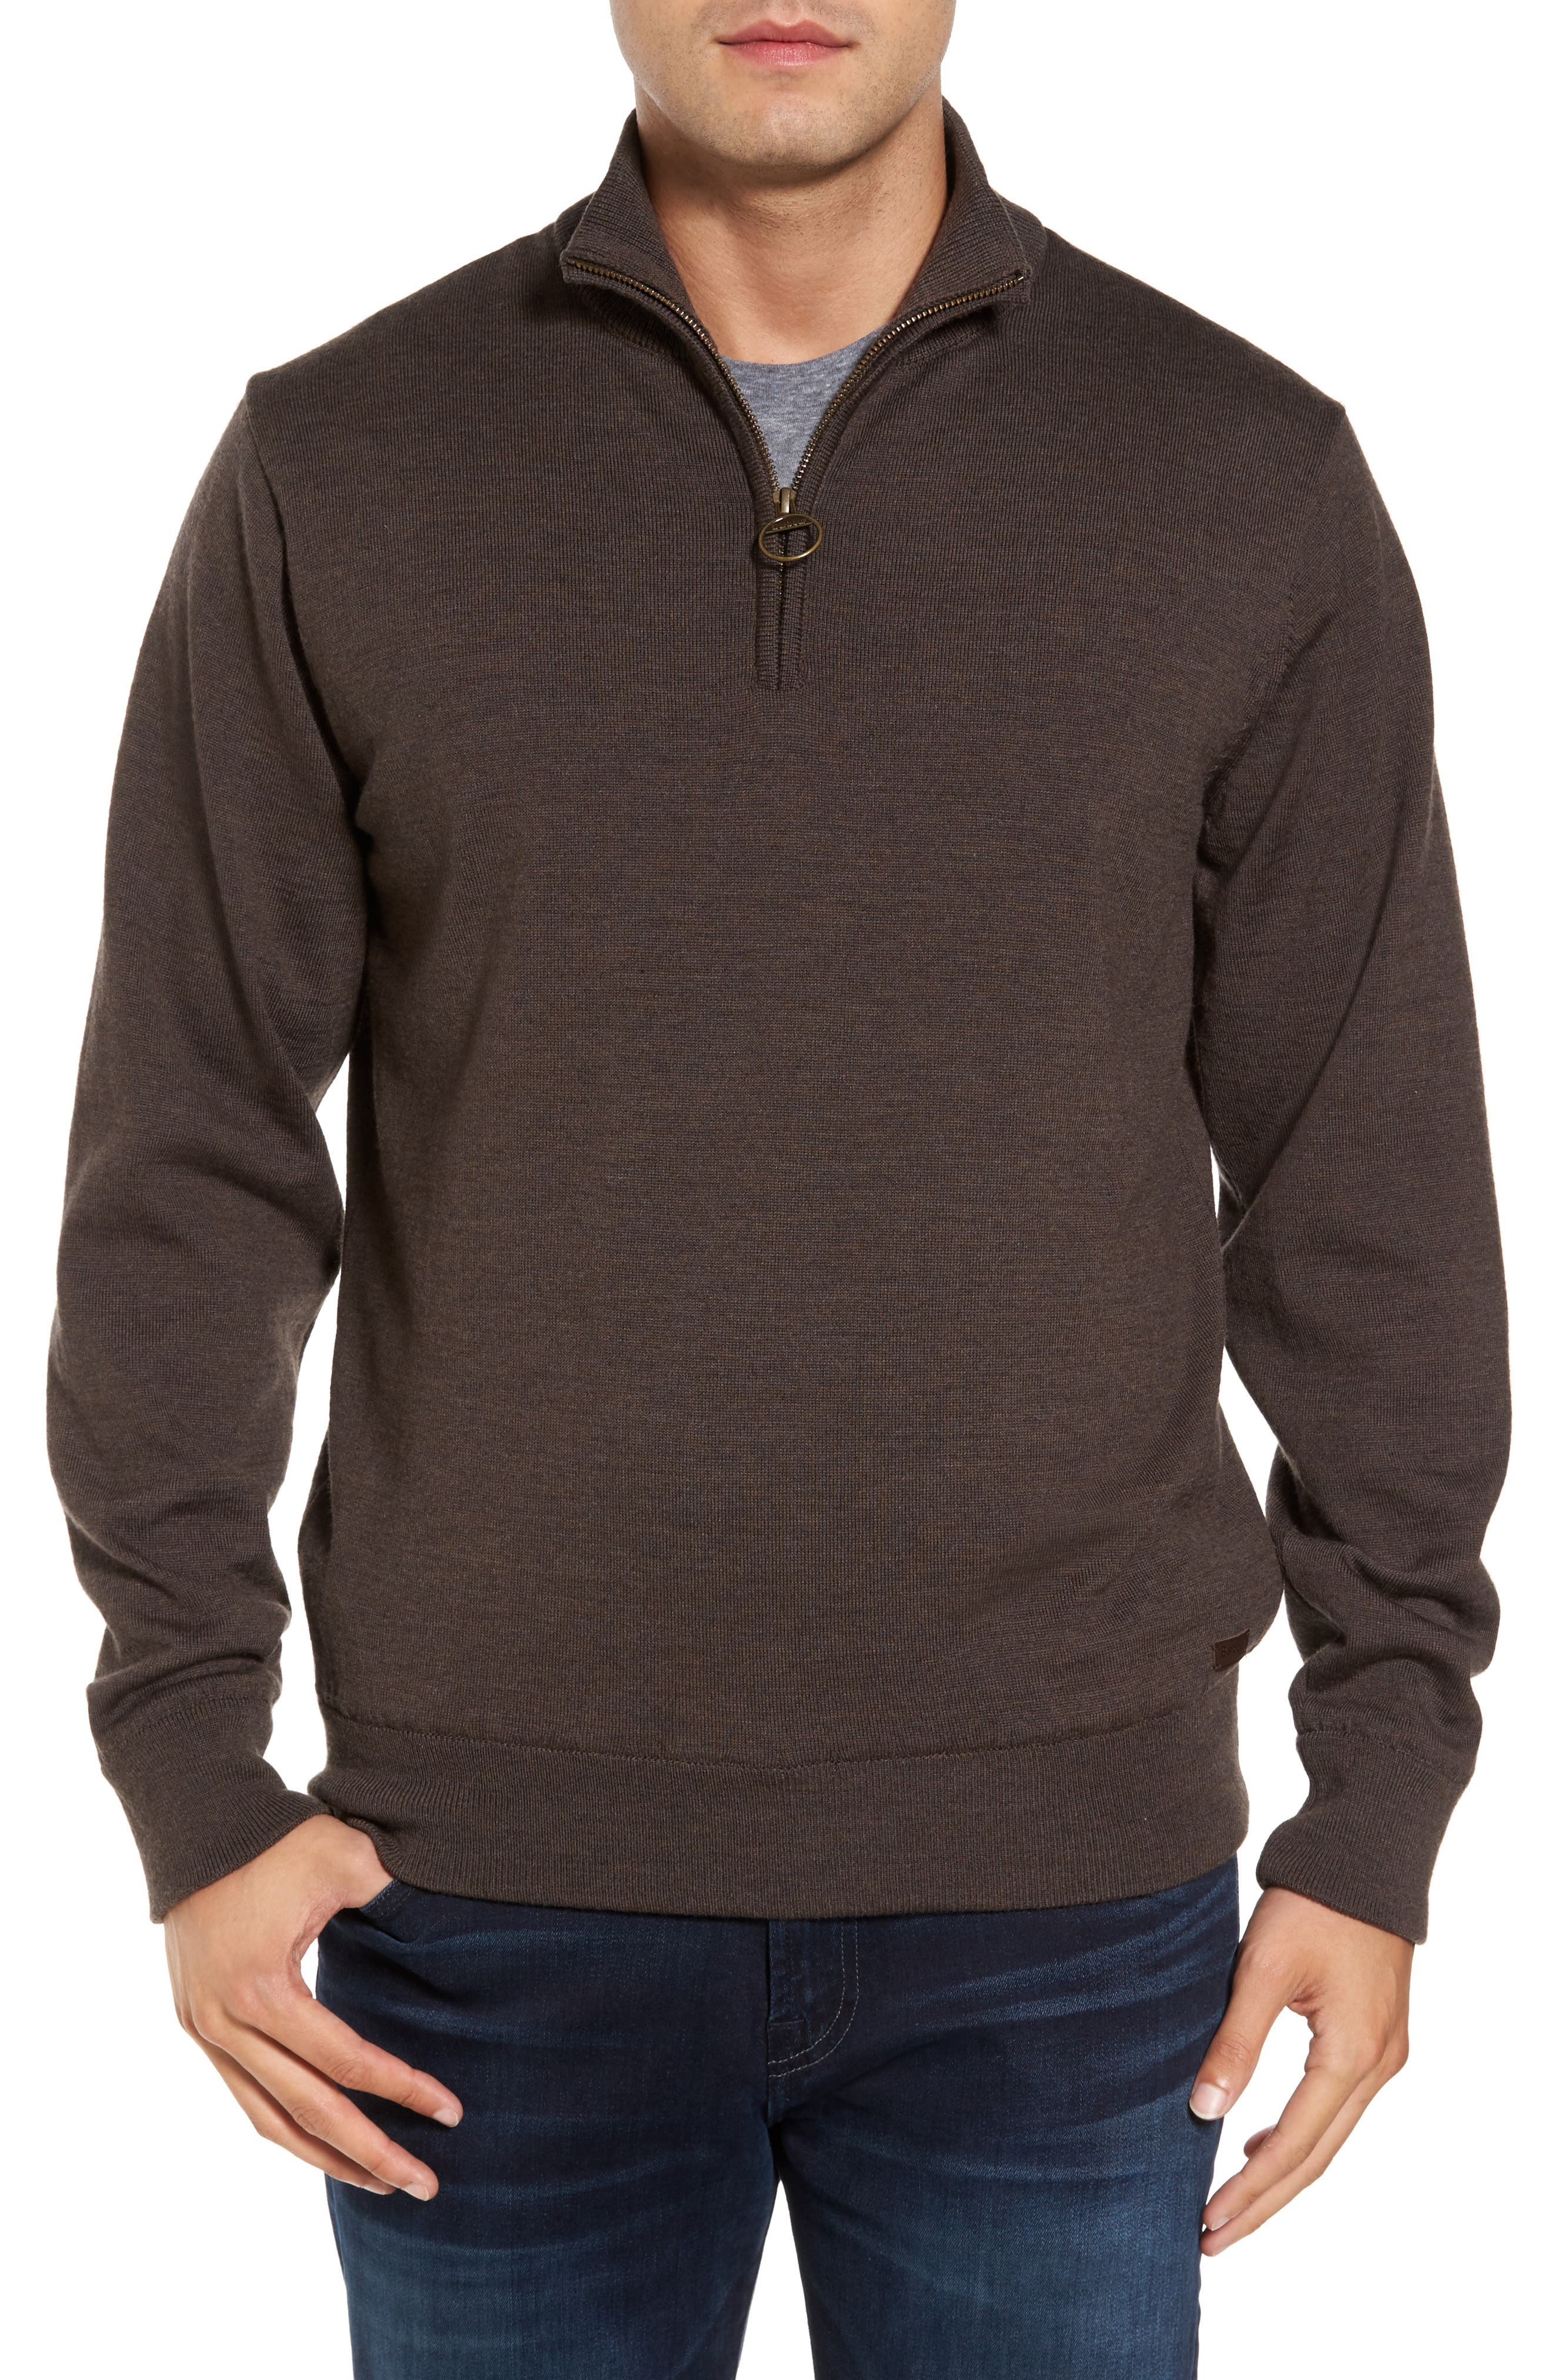 Alternate Image 1 Selected - Barbour Gamlin Quarter Zip Wool Pullover